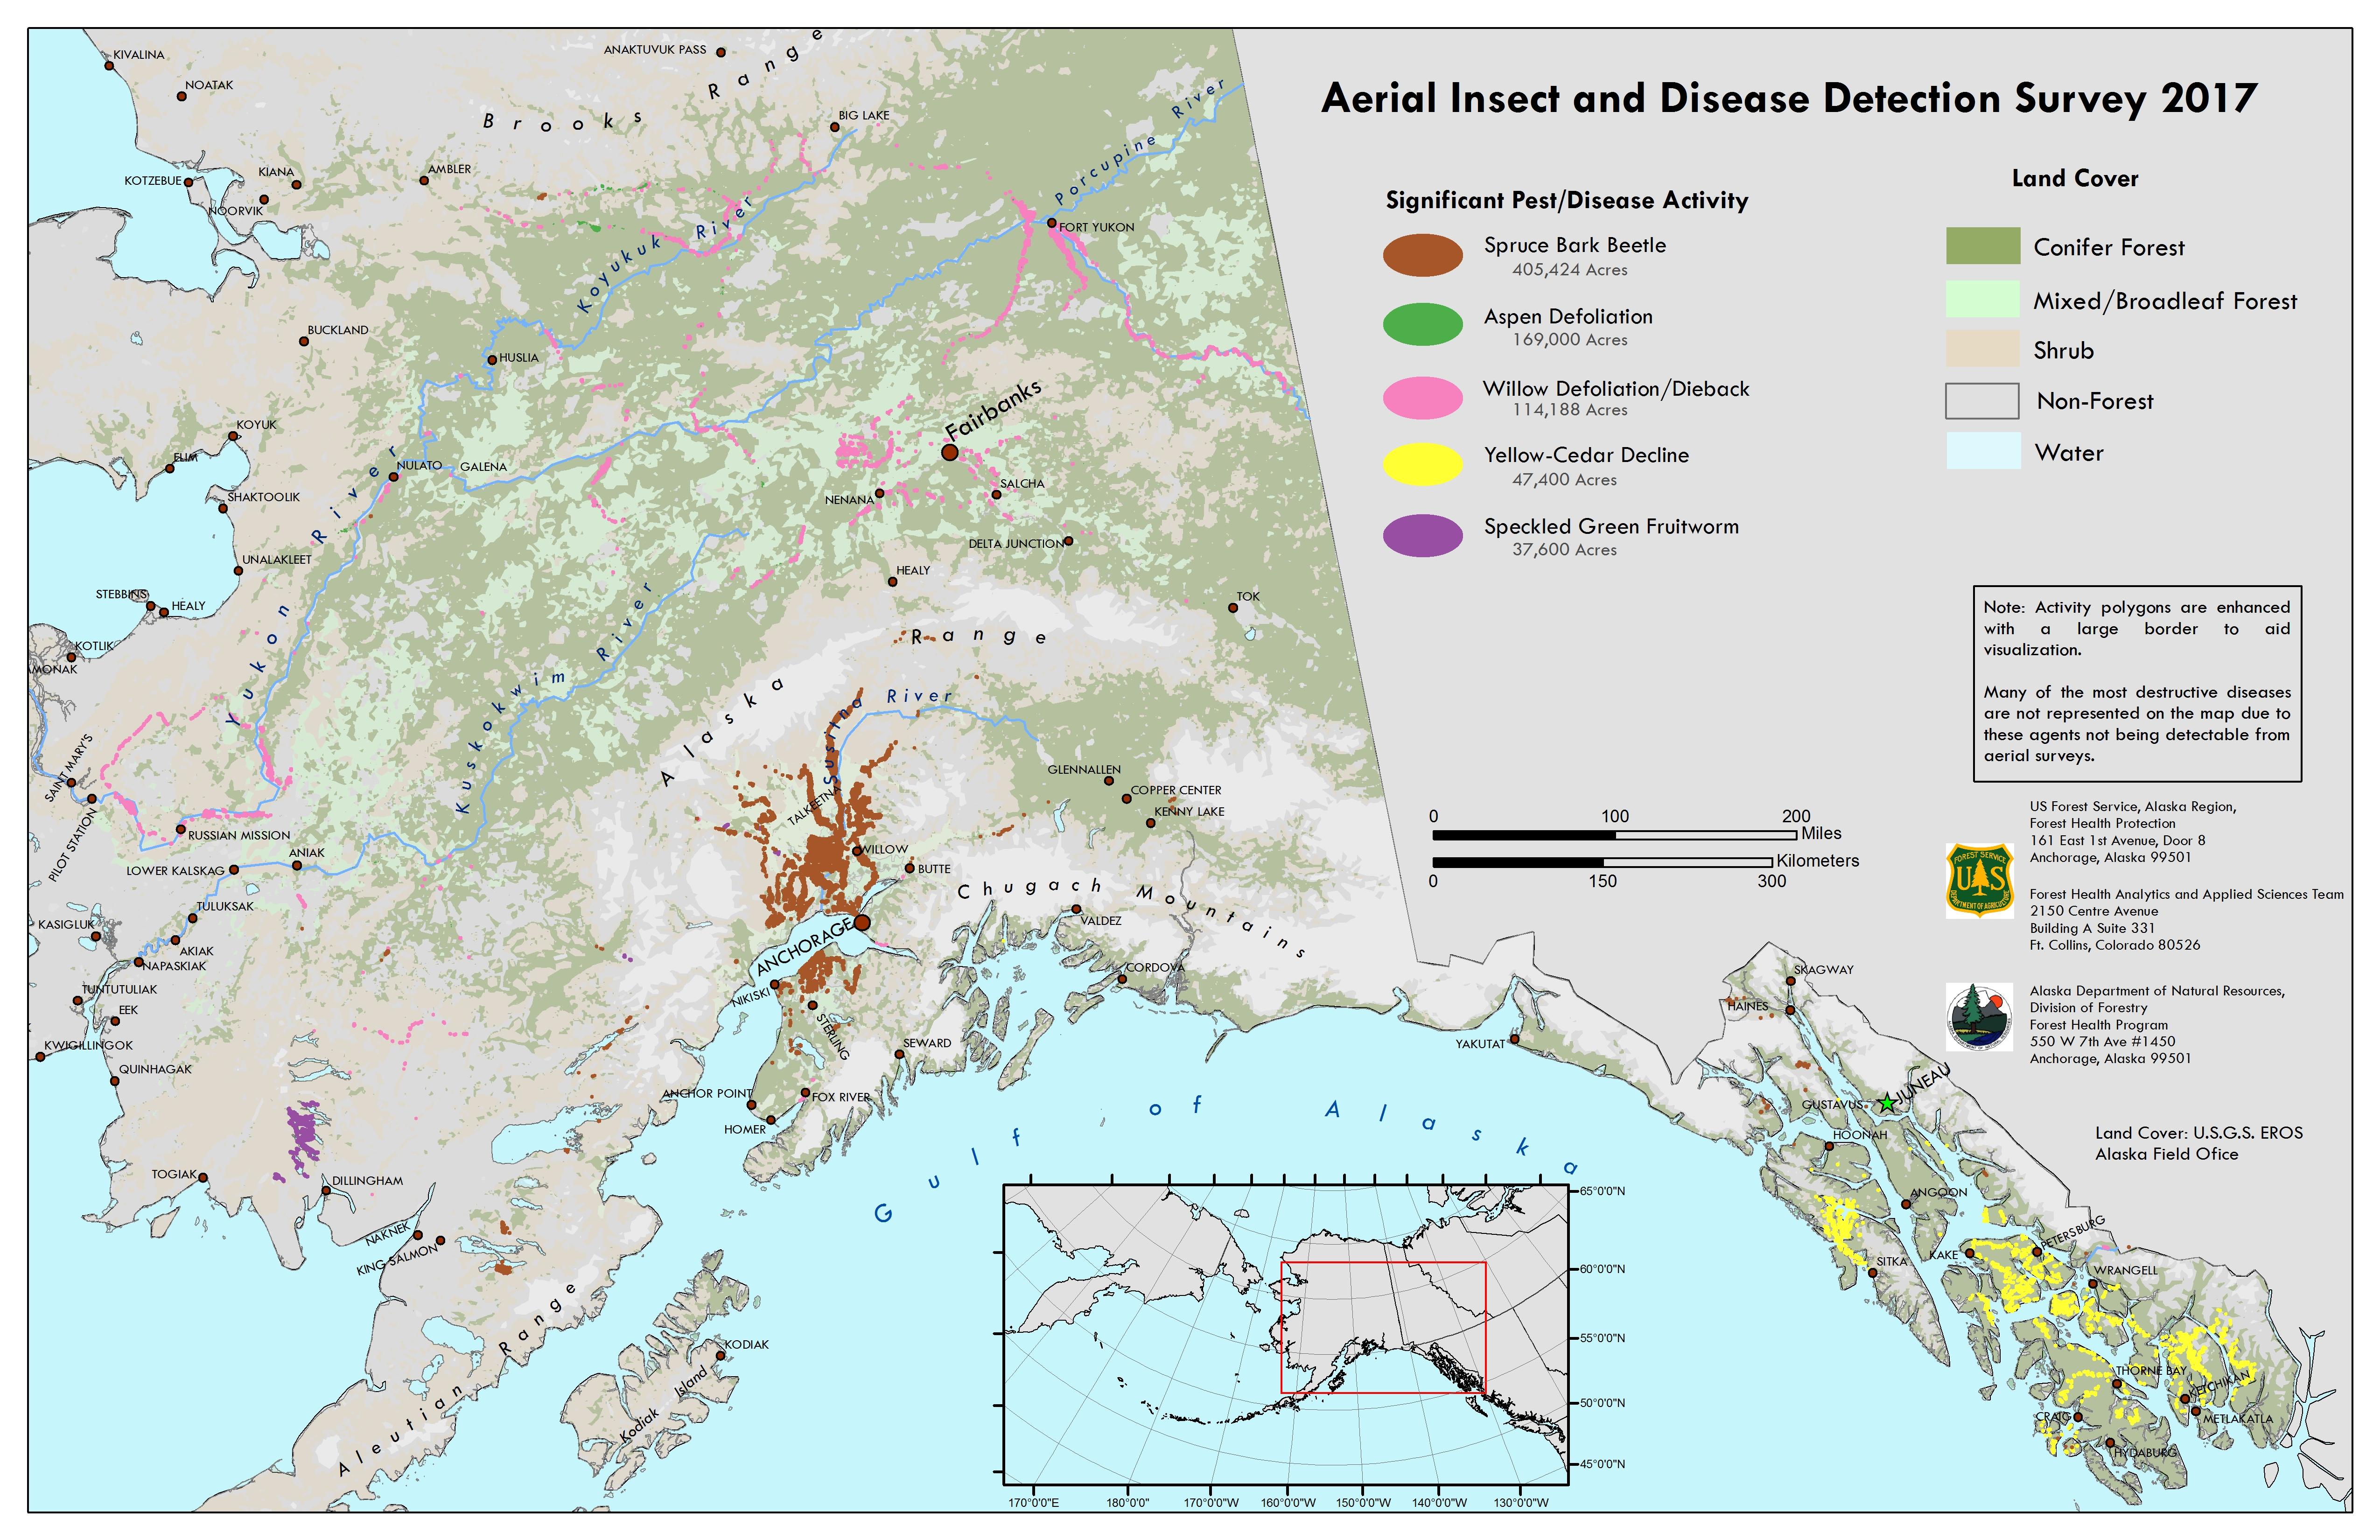 Region 10 - Forest & Grland Health on map of seward alaska, map of vancouver bc, sitka alaska, map of alaska and canada, map of denali alaska, juneau alaska, map of homer alaska, map of southeast alaska, map of wasilla alaska, map of naknek alaska, large print map of alaska, map of alaska inside passage, road map of alaska, map of kotzebue alaska, skagway alaska, outline map of alaska, ketchican alaska, map of hoonah alaska, juno alaska, map of craig alaska,